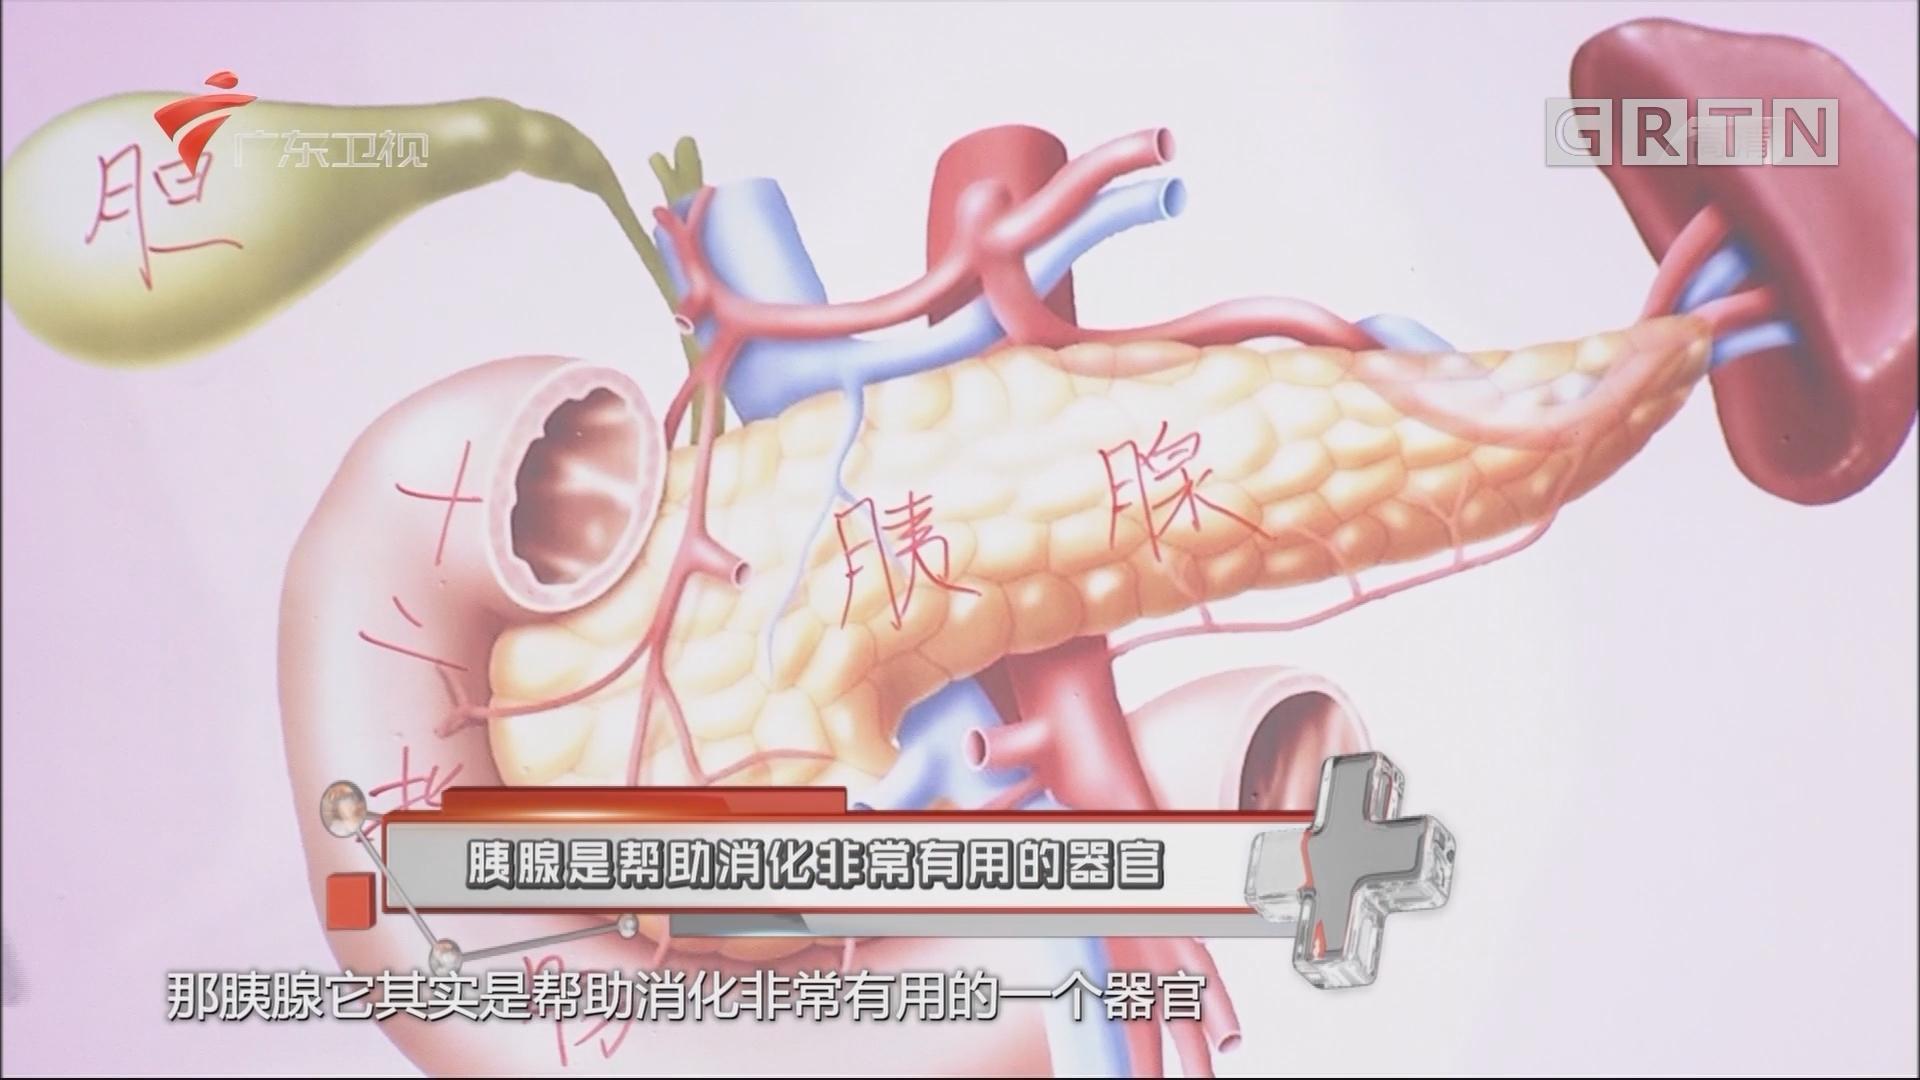 [HD][2018-05-25]健康有道:胰腺是帮助消化非常有用的器官